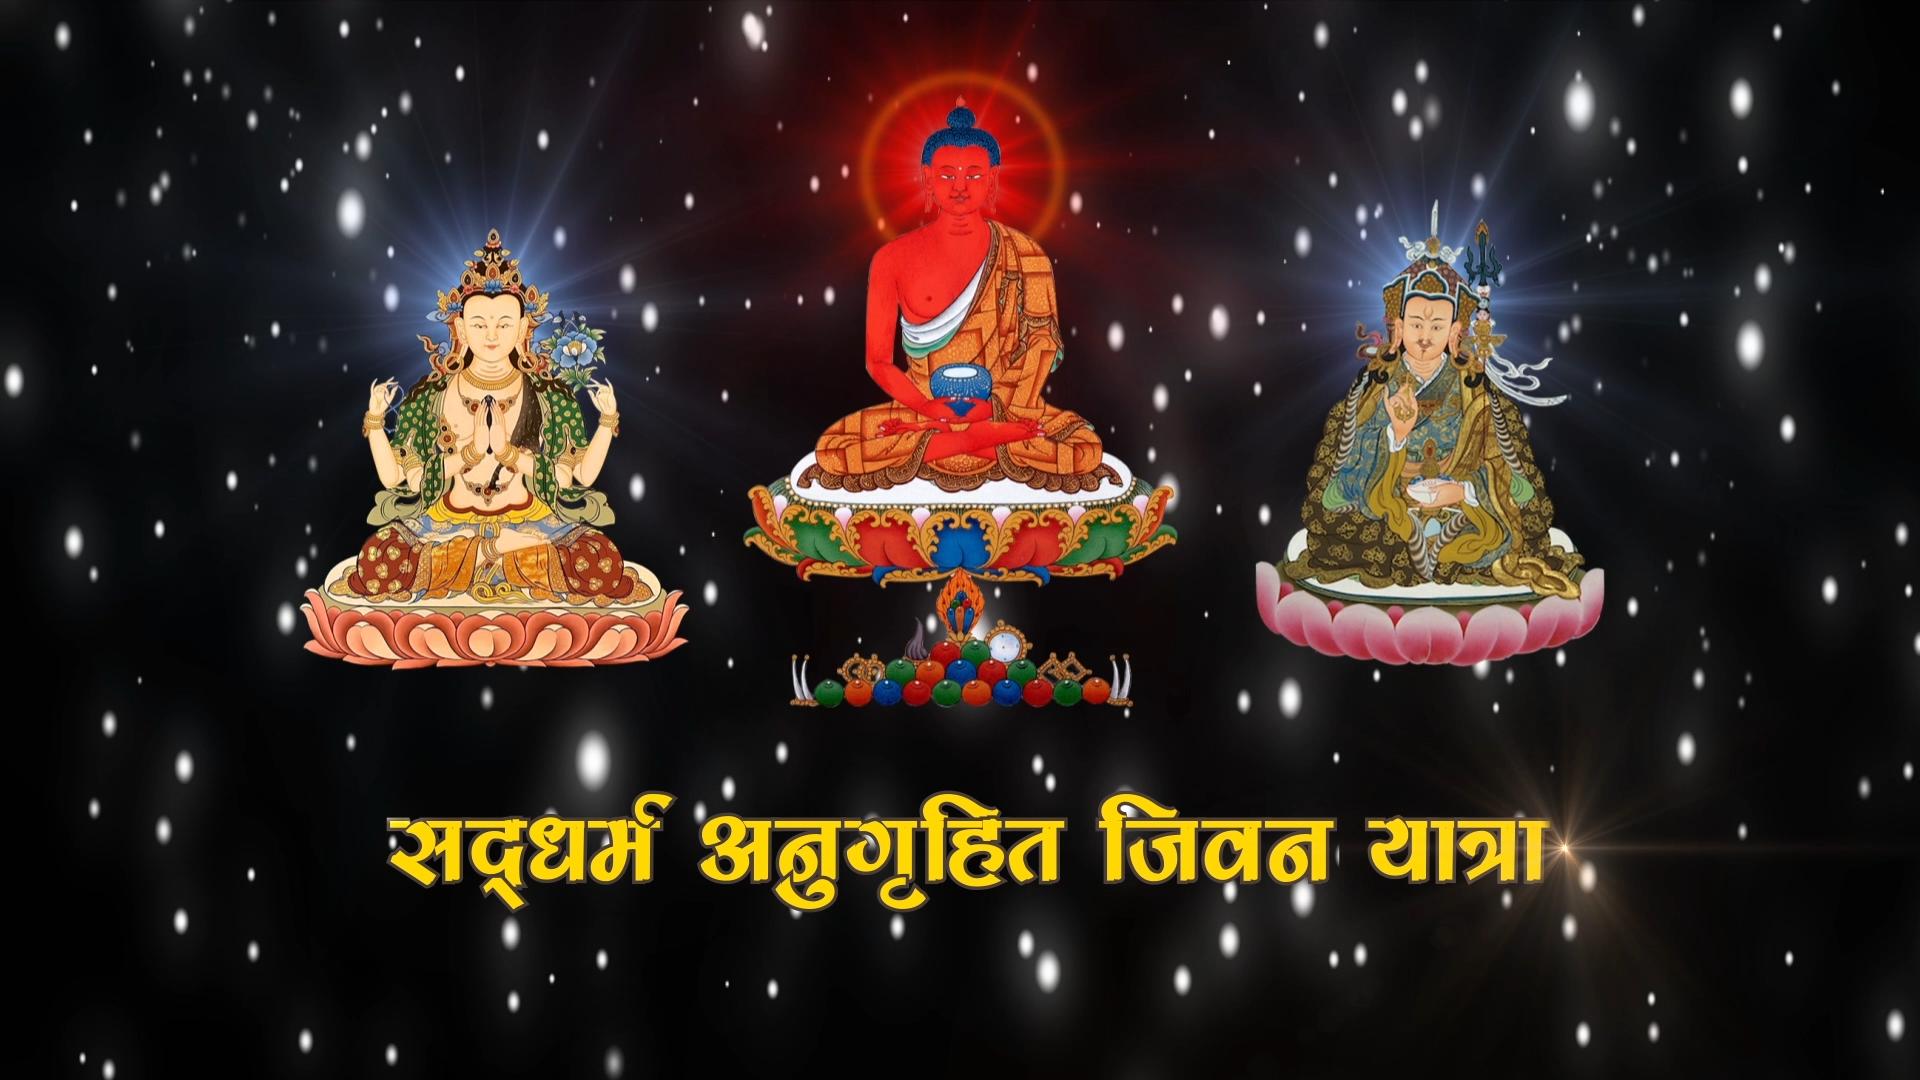 Saddharma Anugrihit Jivan Yatra